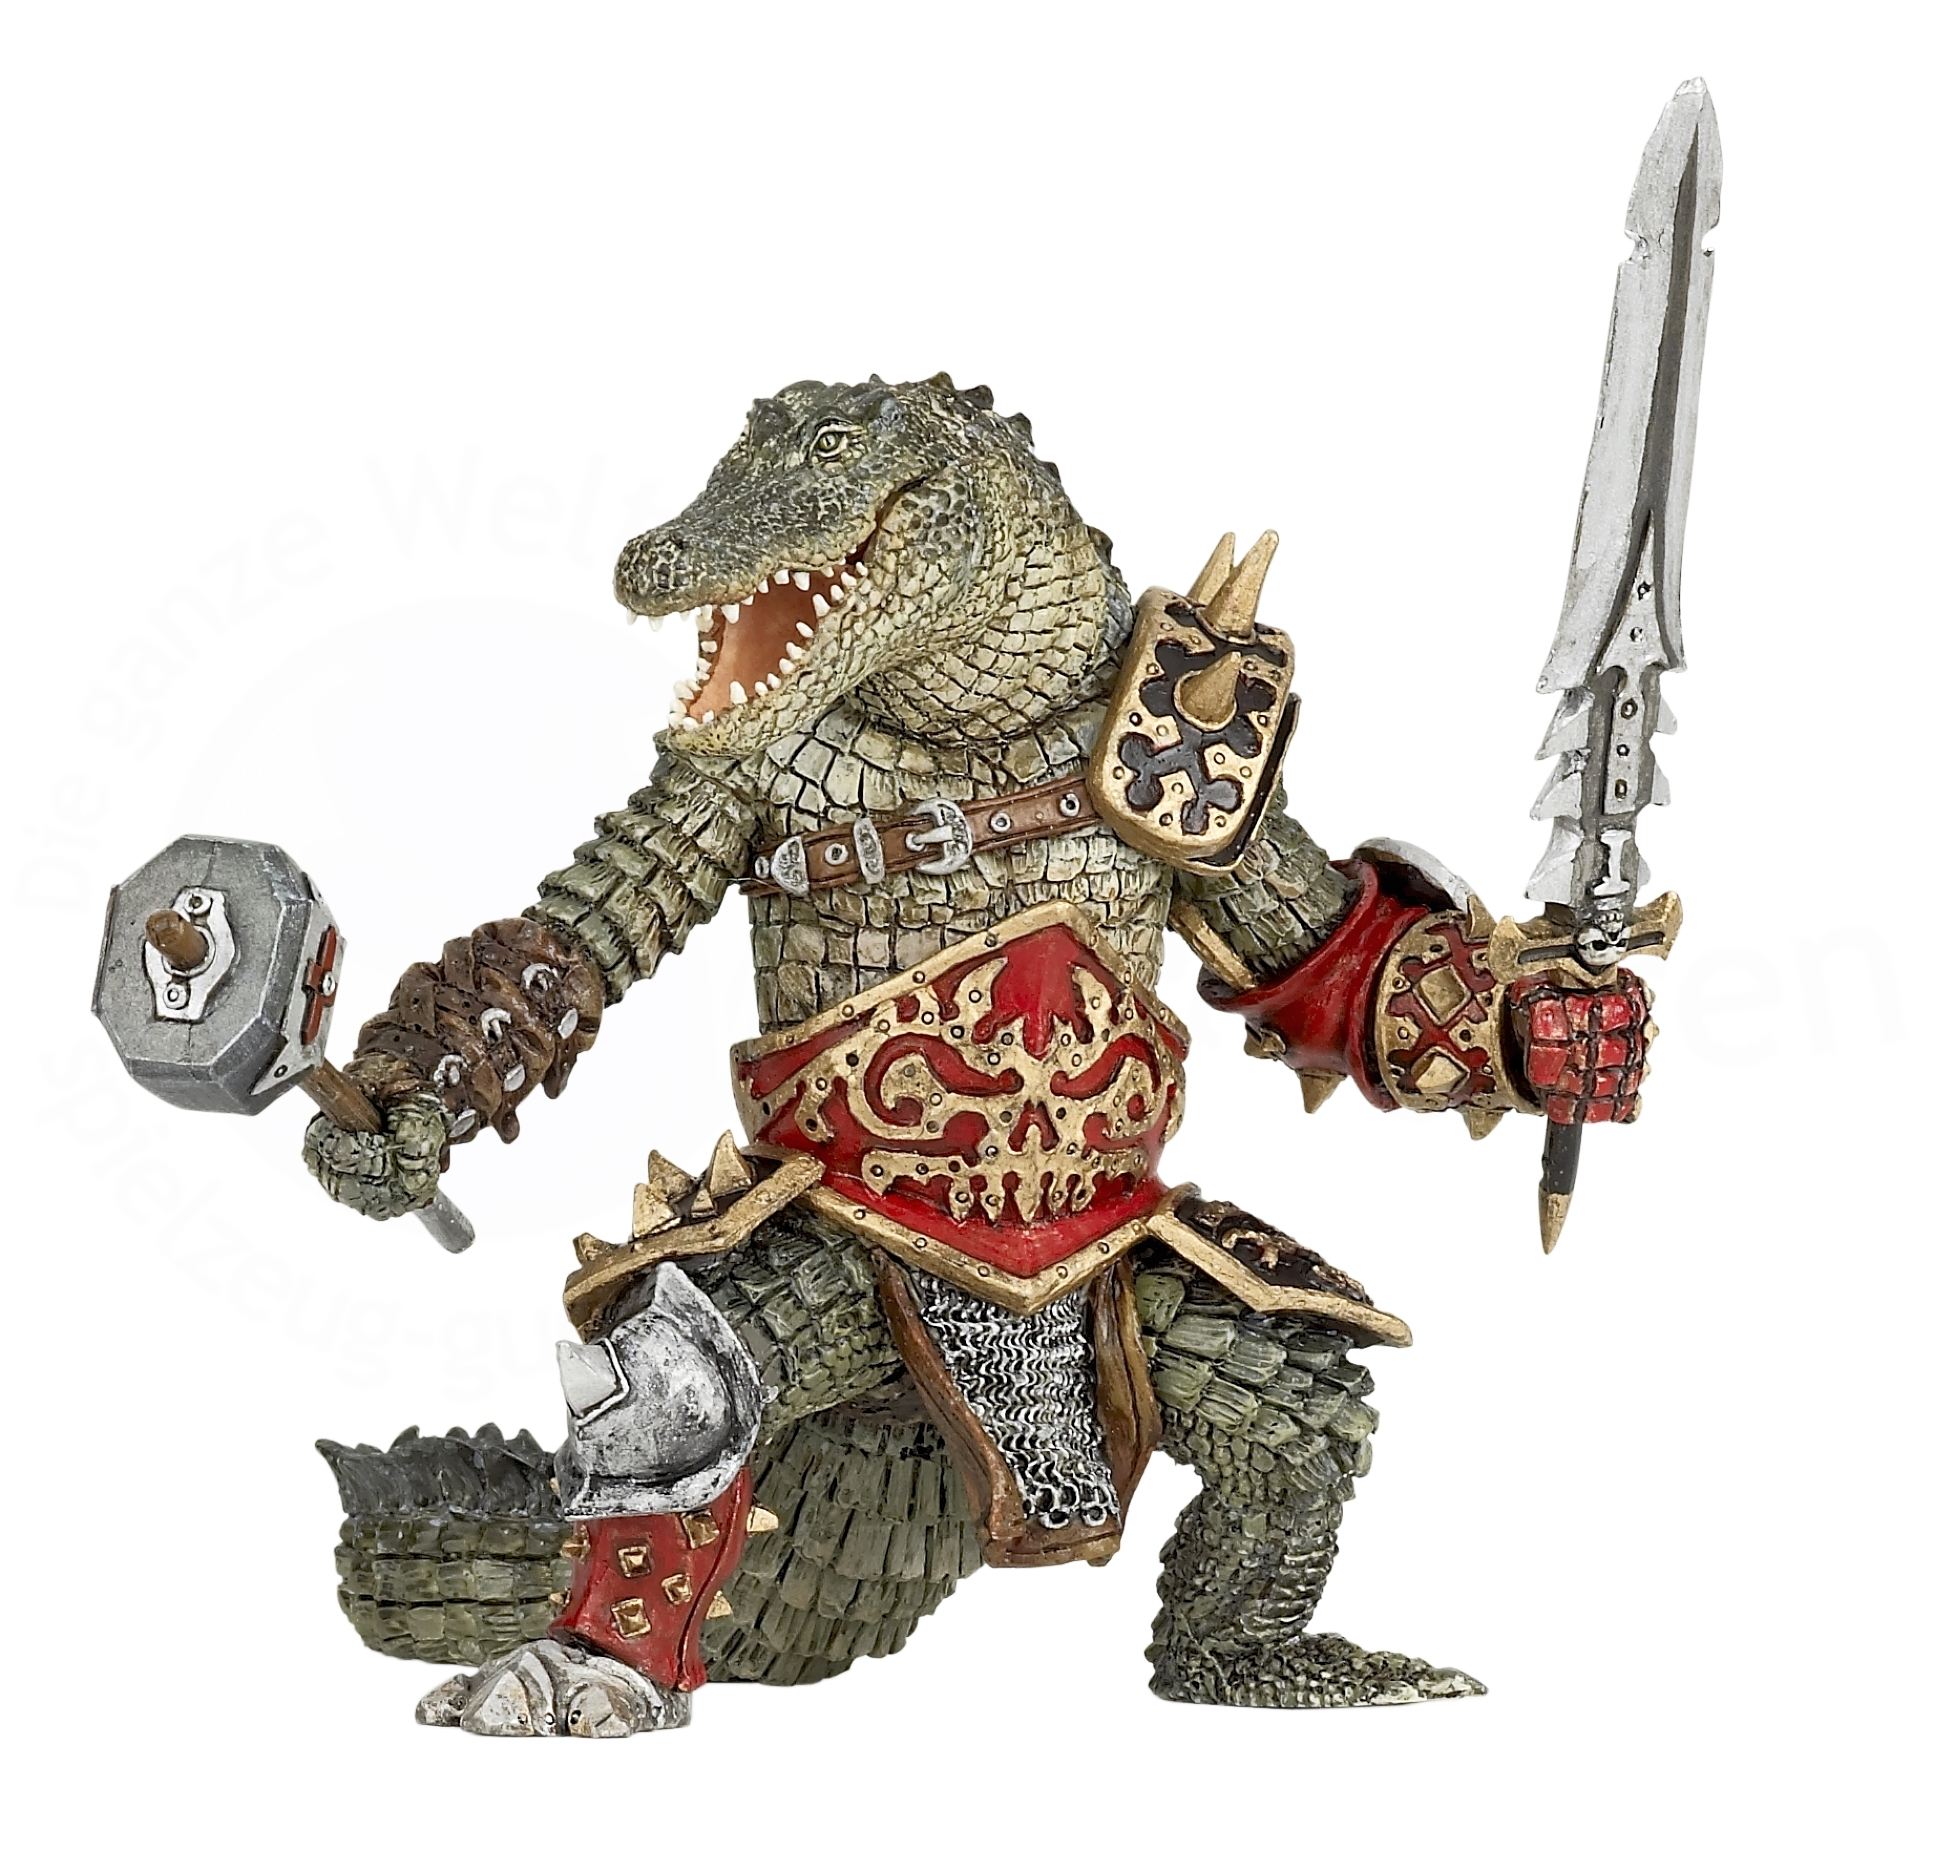 Фигурка Человек-крокодил фото